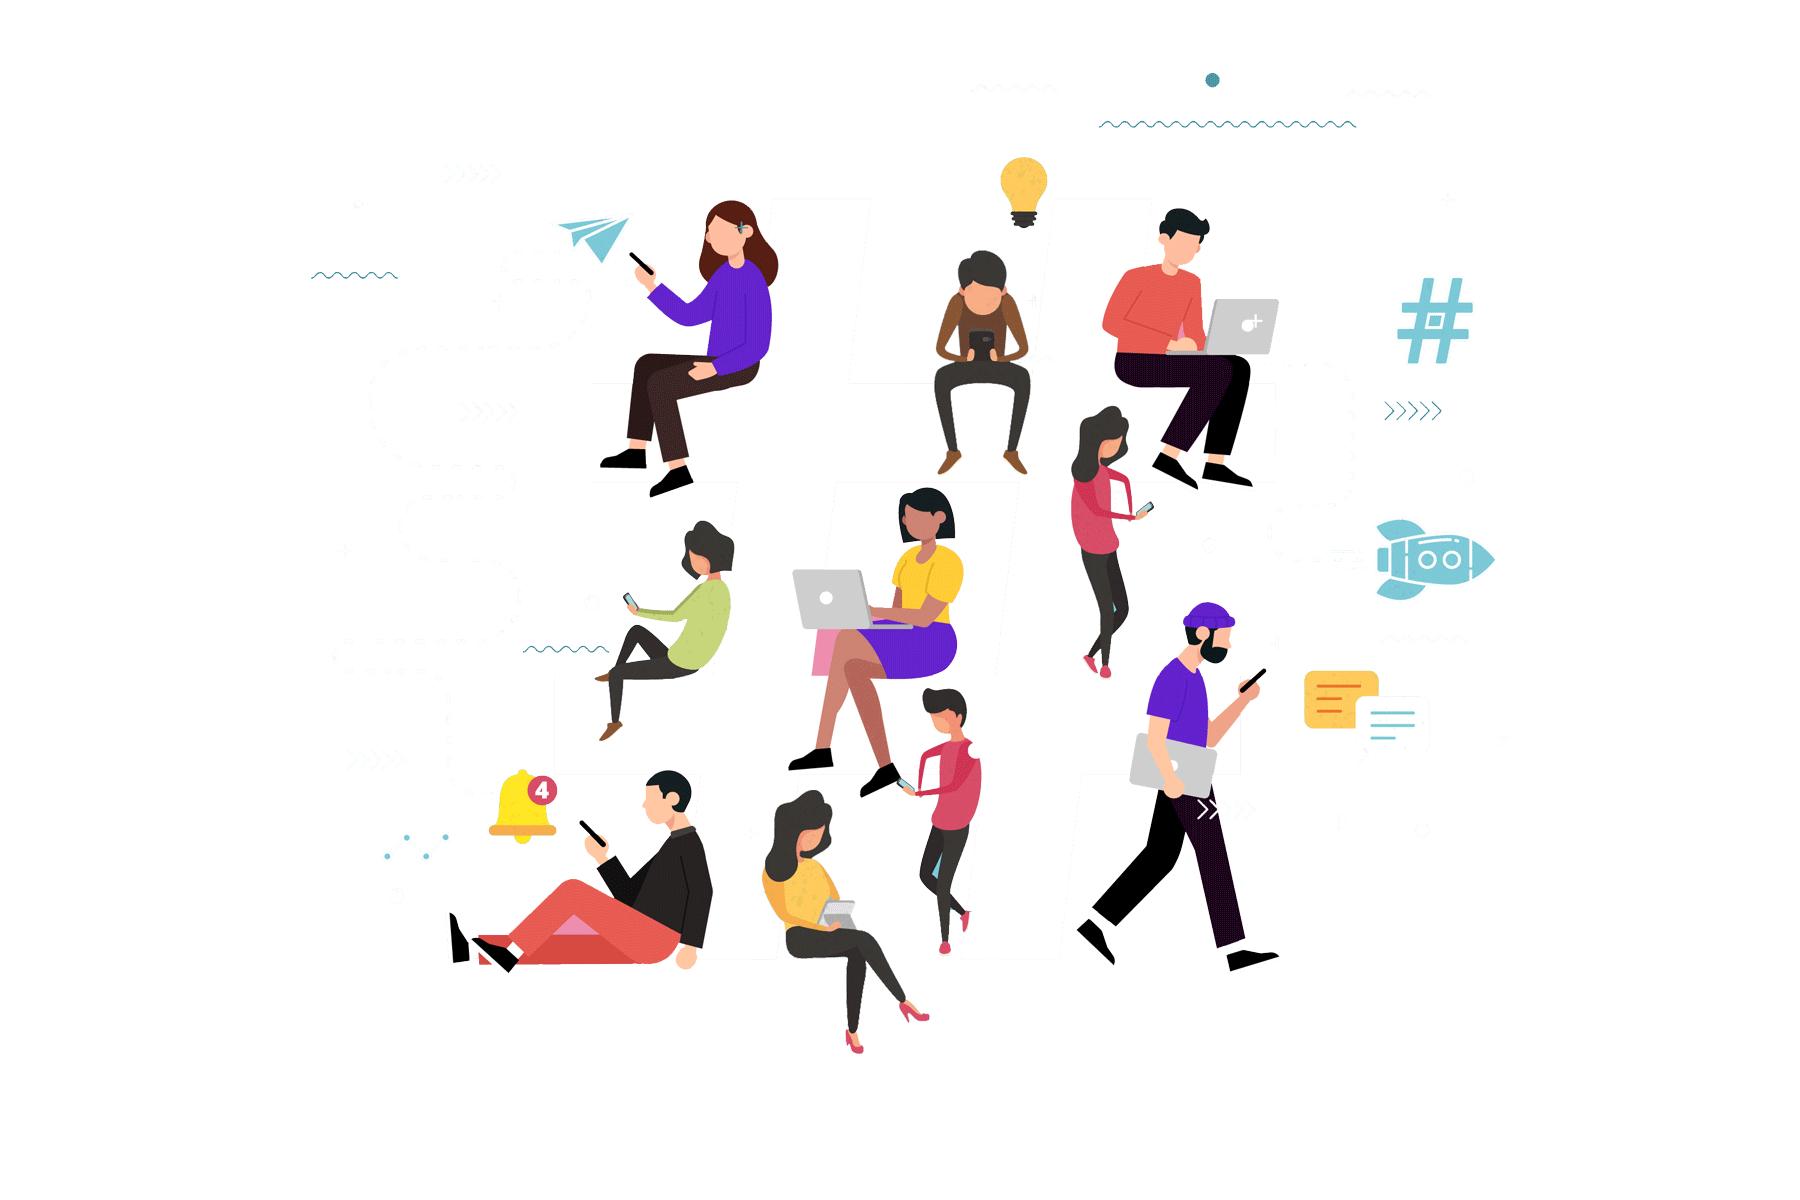 DataEthics4All-Community-Conversations